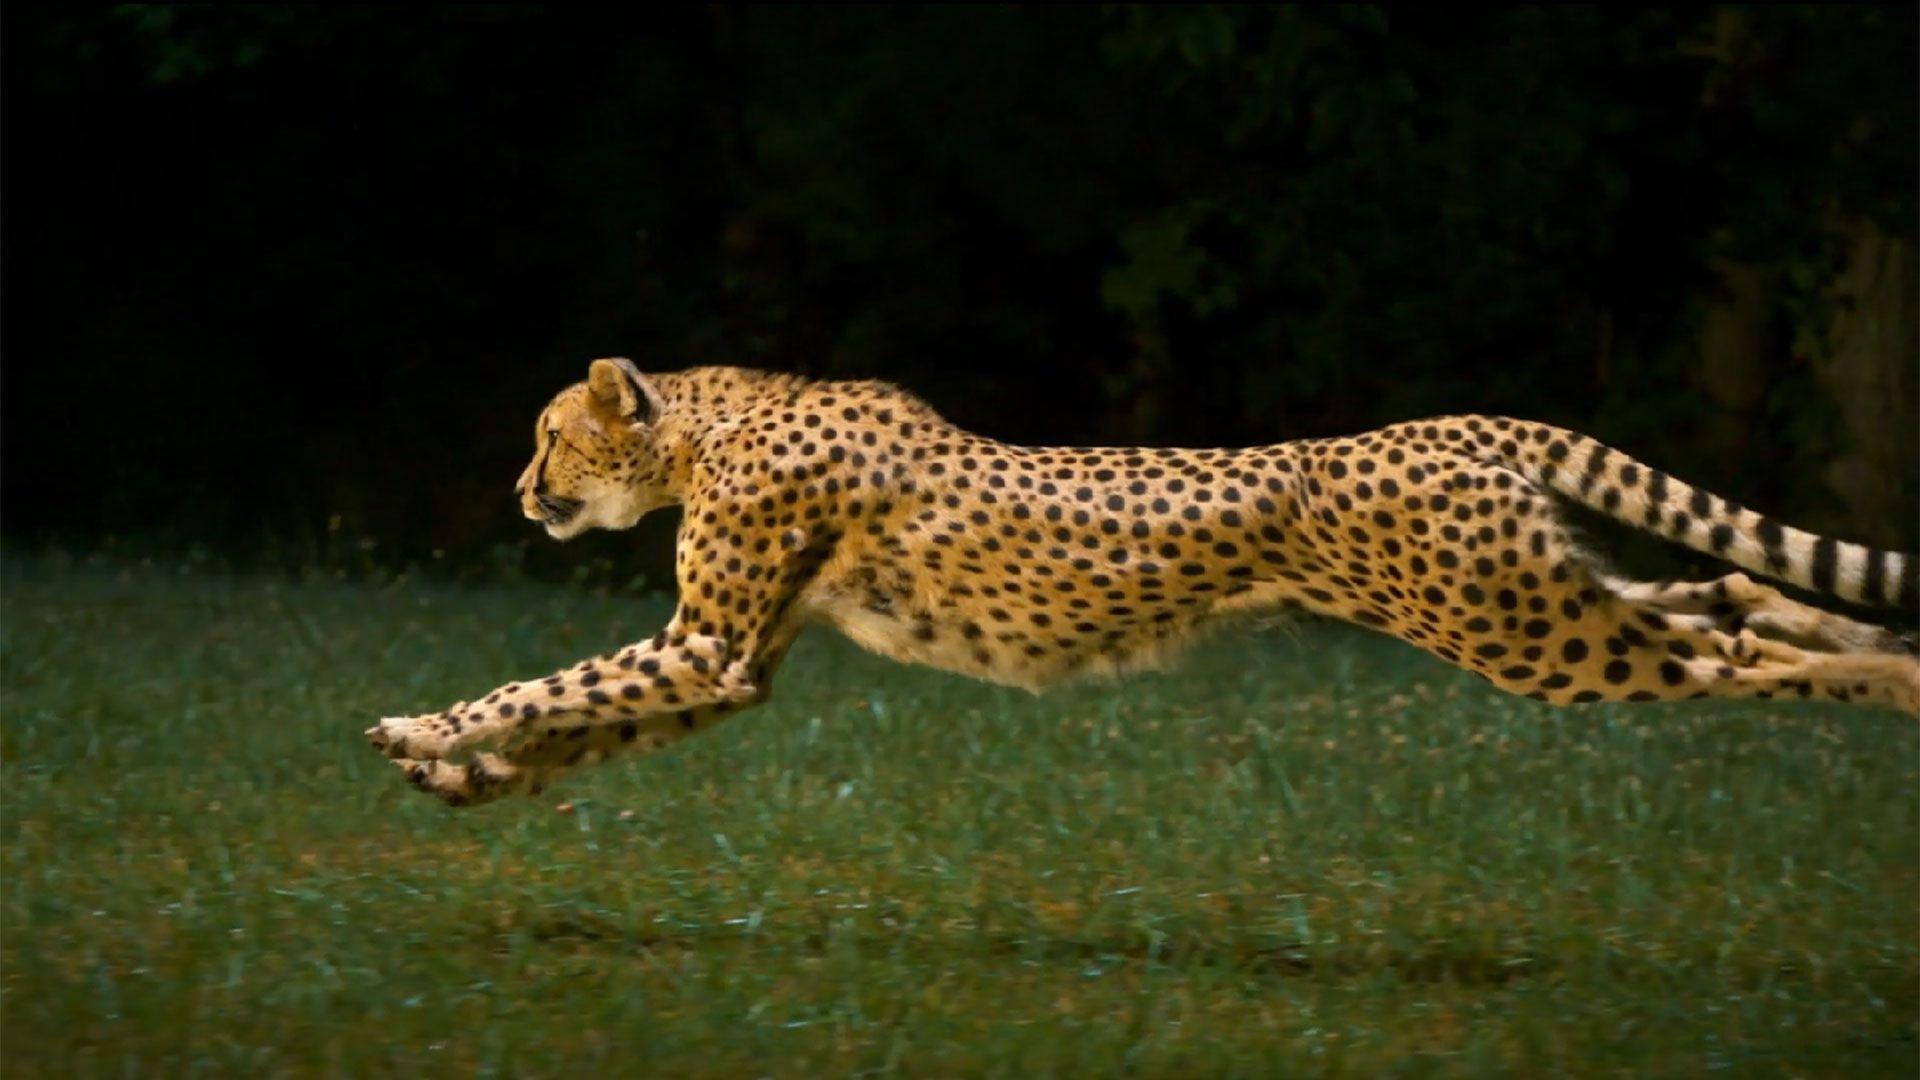 Running Cheetah Hd Wallpapers